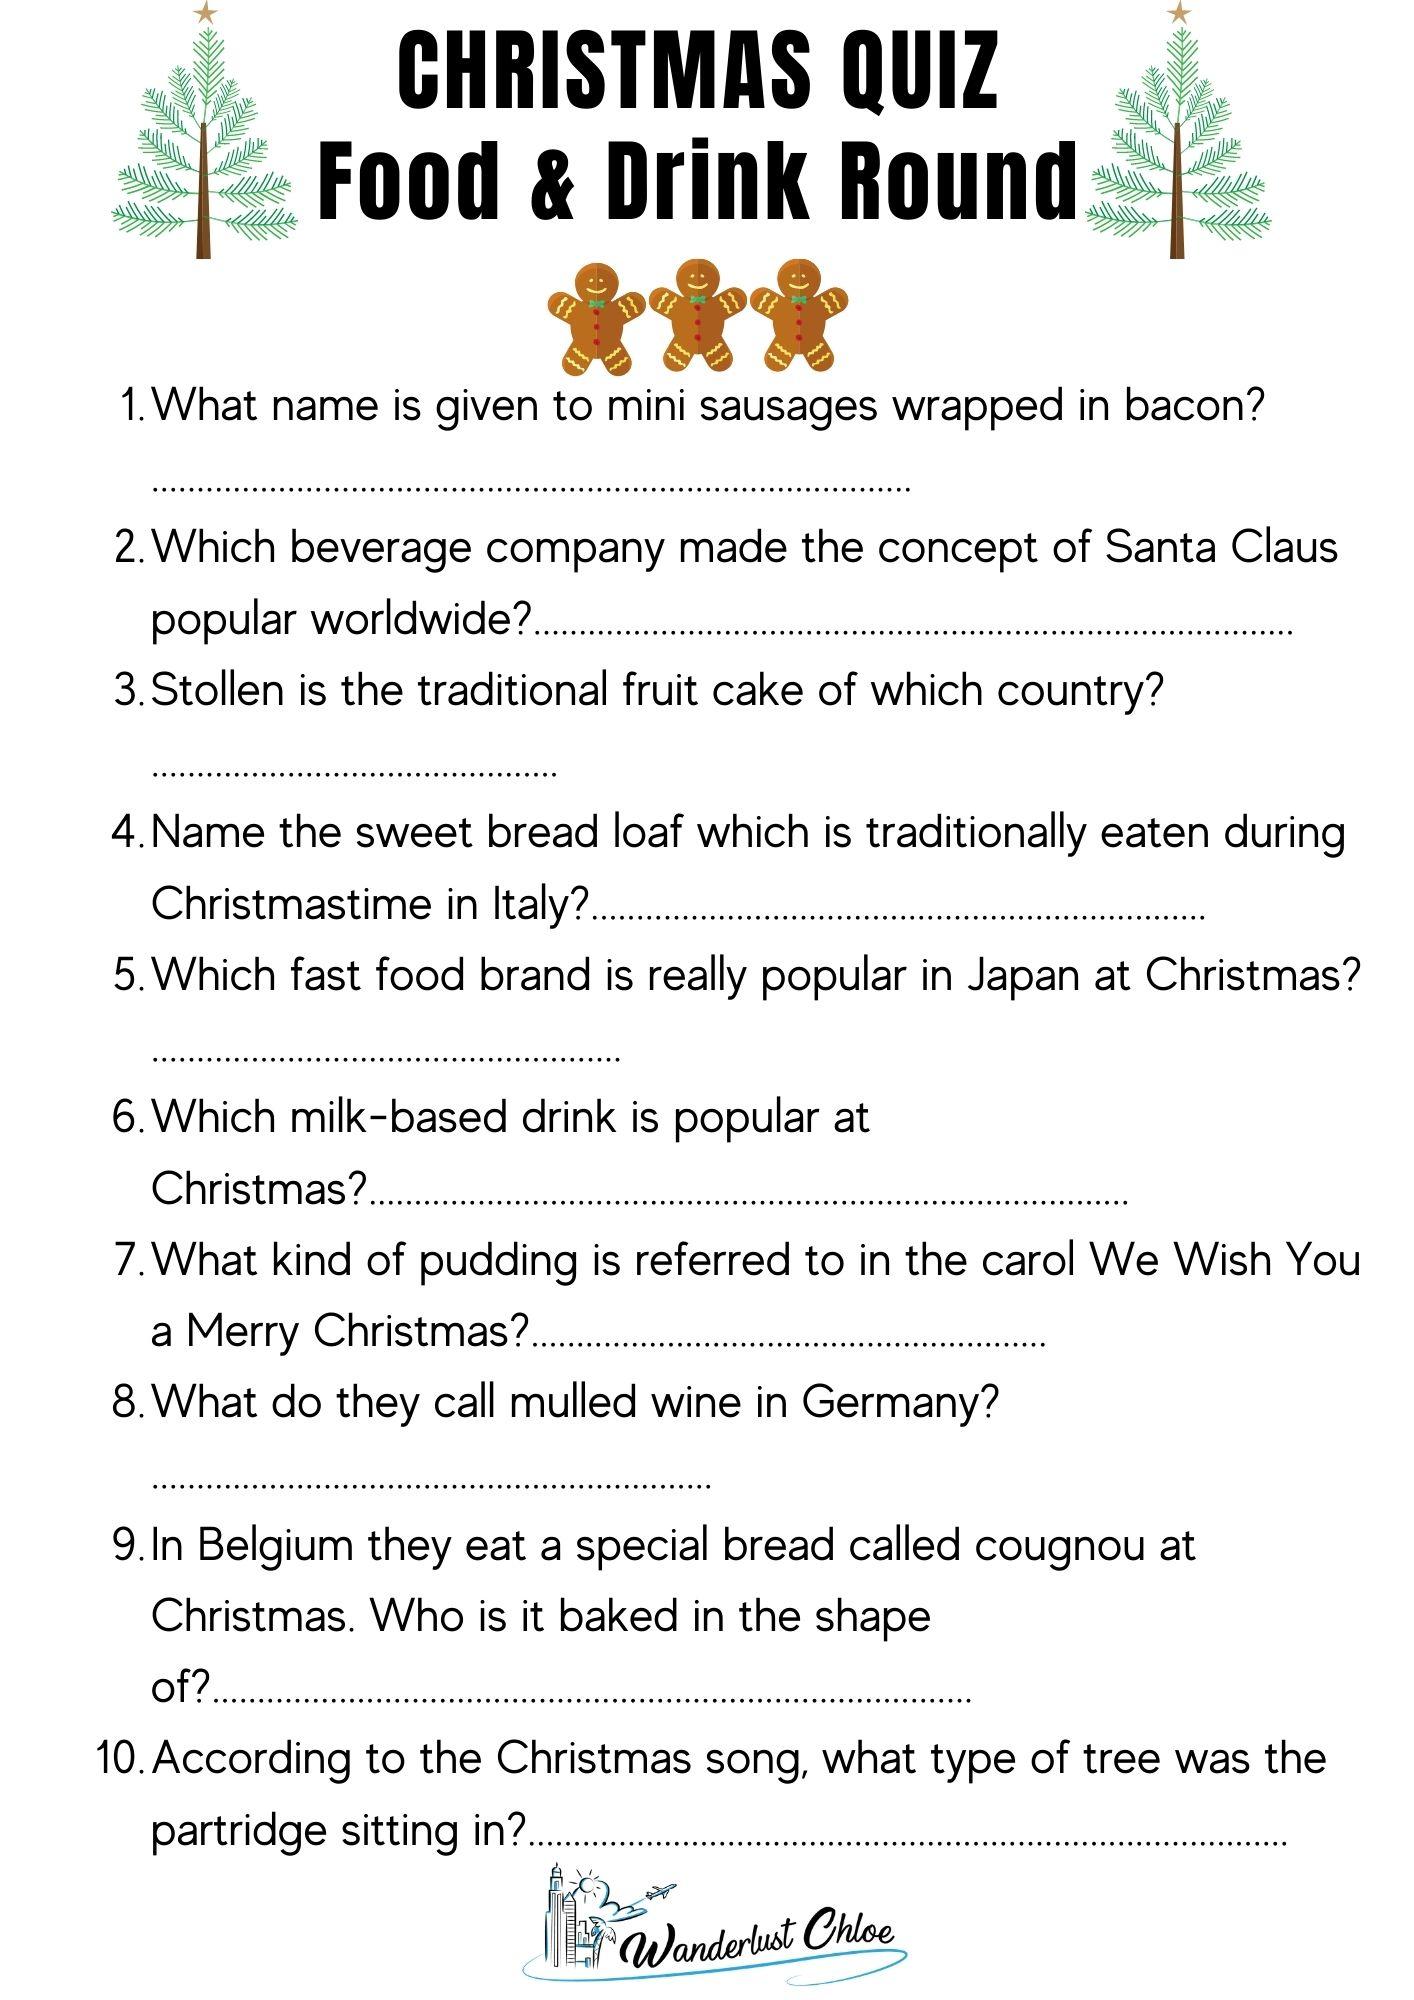 Printable Christmas Quiz Questions - Food & Drink